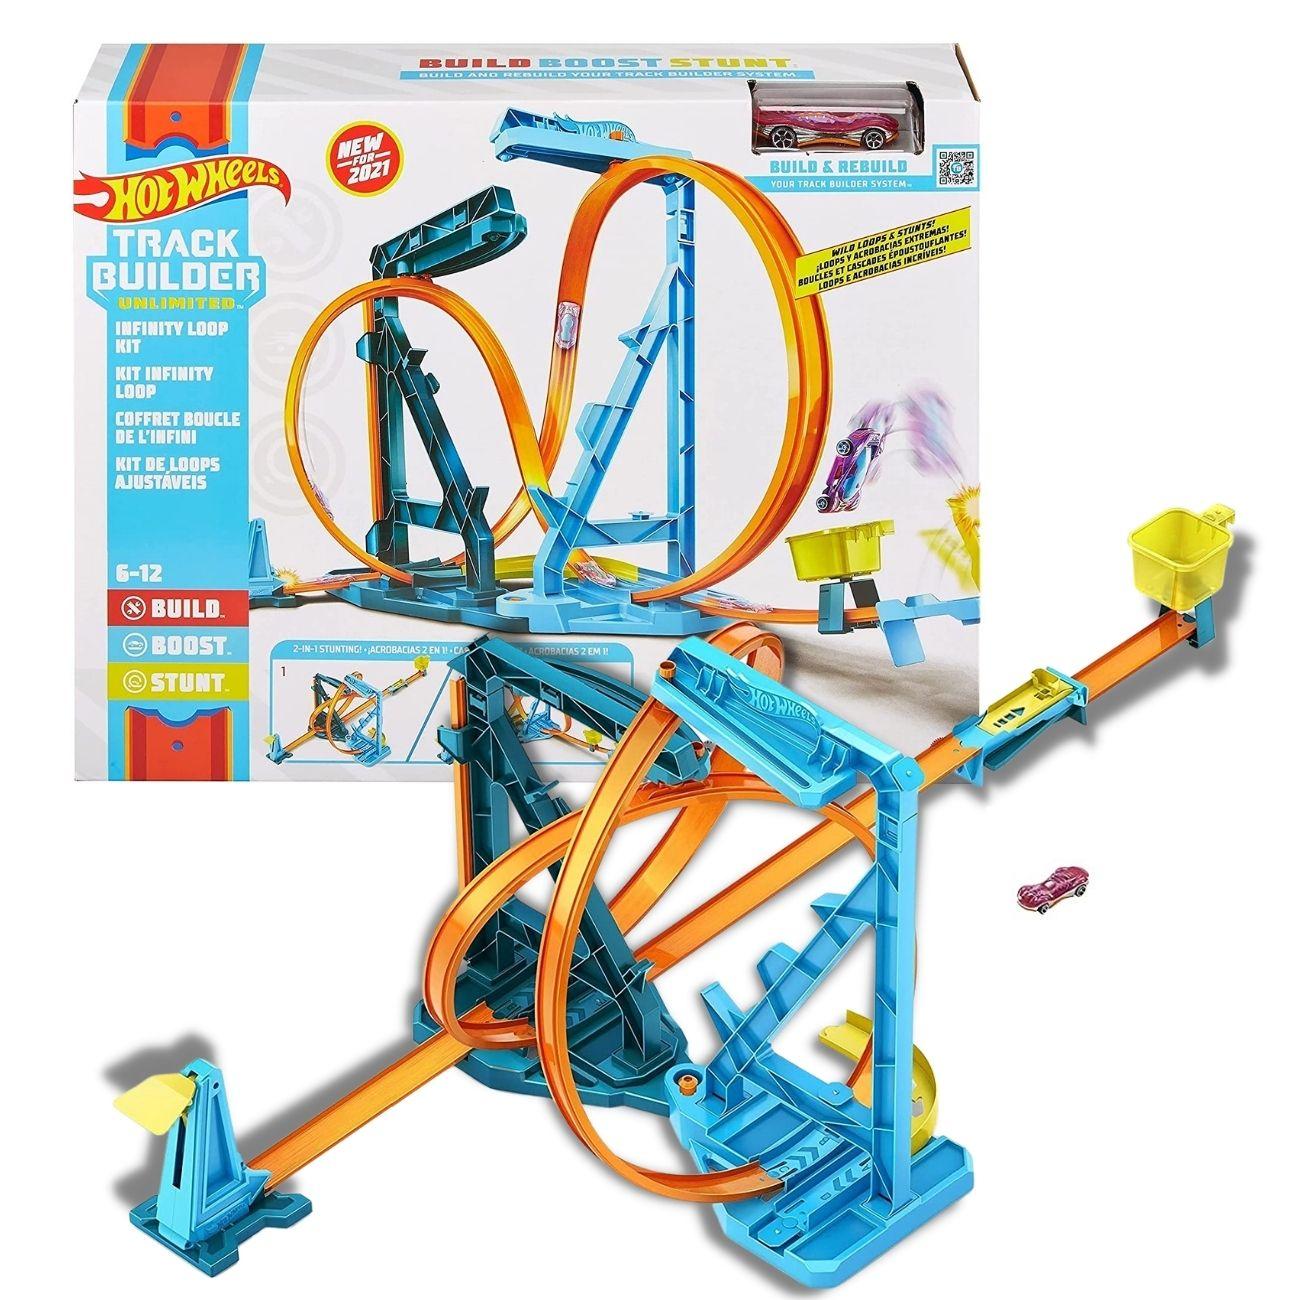 Pista Hot Wheels - Kit Loops Ajustáveis - Mattel Brinquedos